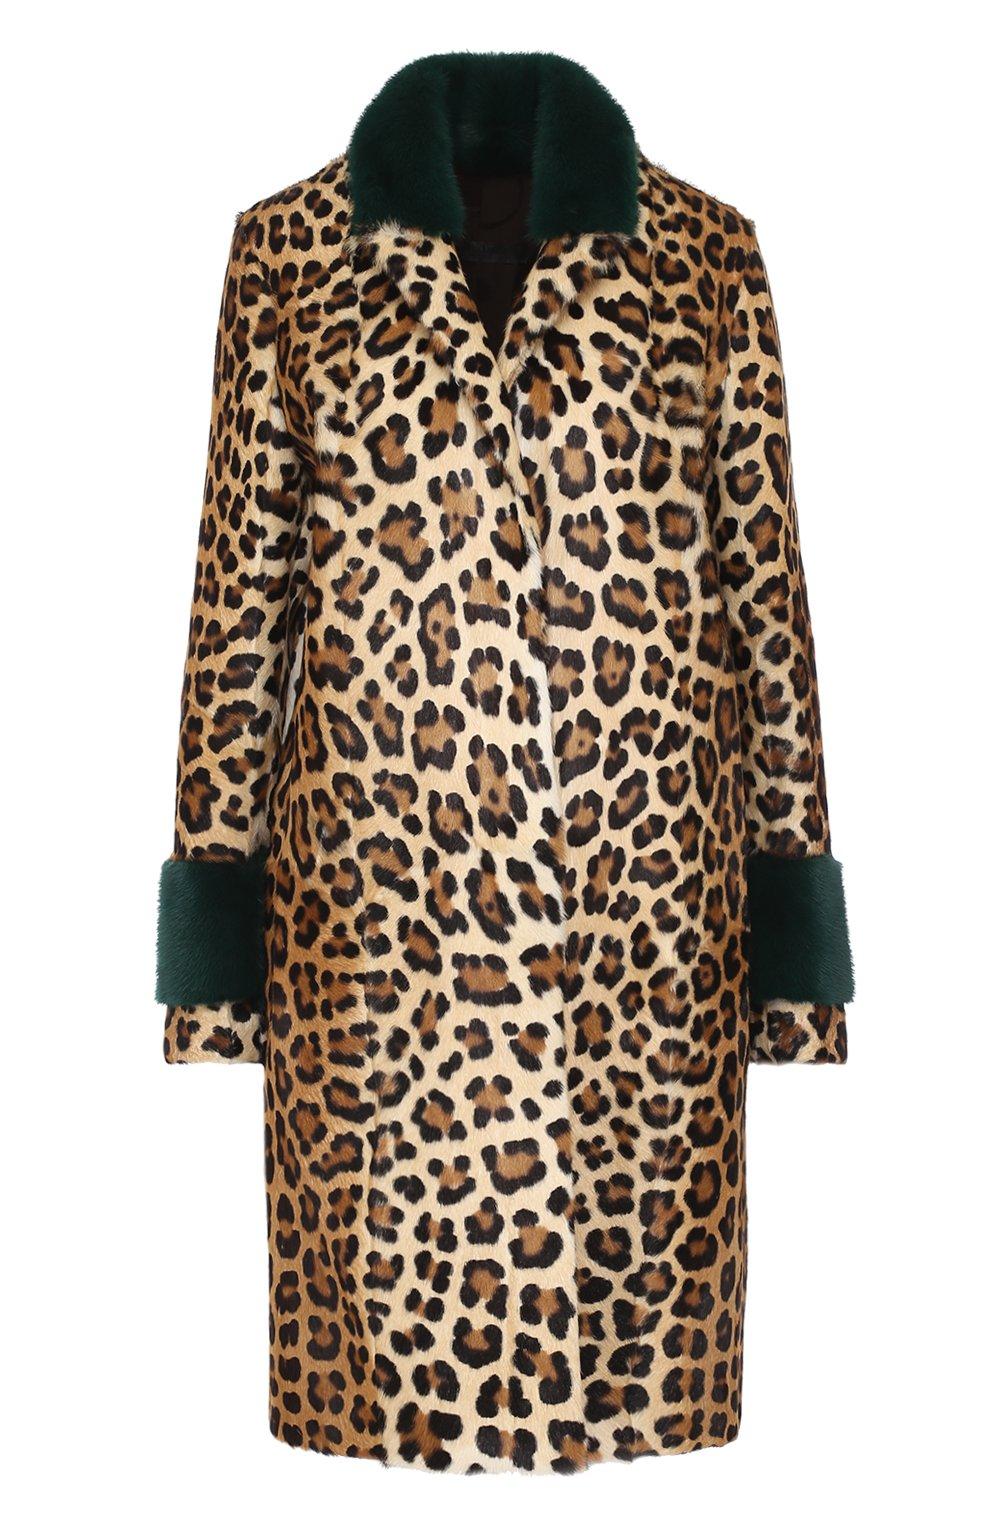 Шуба из меха норки и козлика с леопардовым принтом Simonetta Ravizza леопардовая   Фото №1